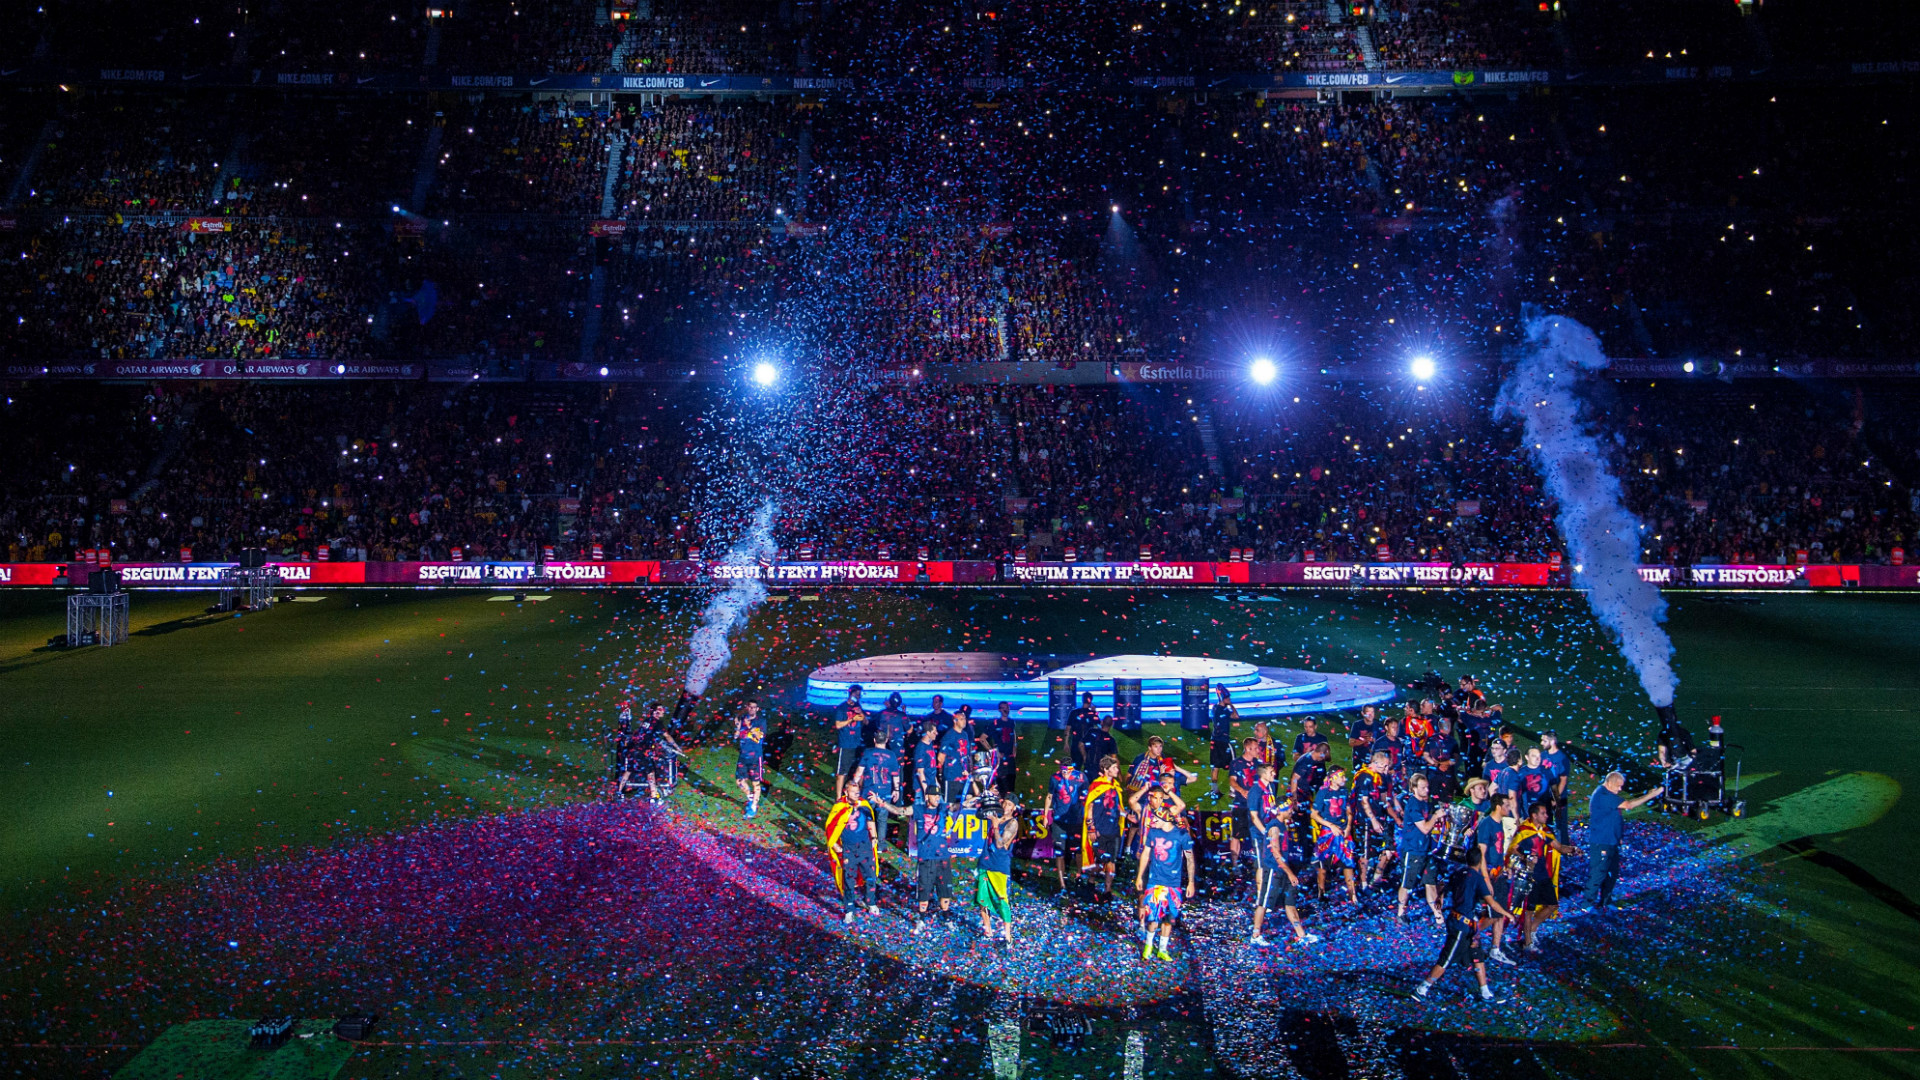 Fondos De Pantalla Camp Nou España El Fc Barcelona: Barcelona Treble Celebration Camp Nou